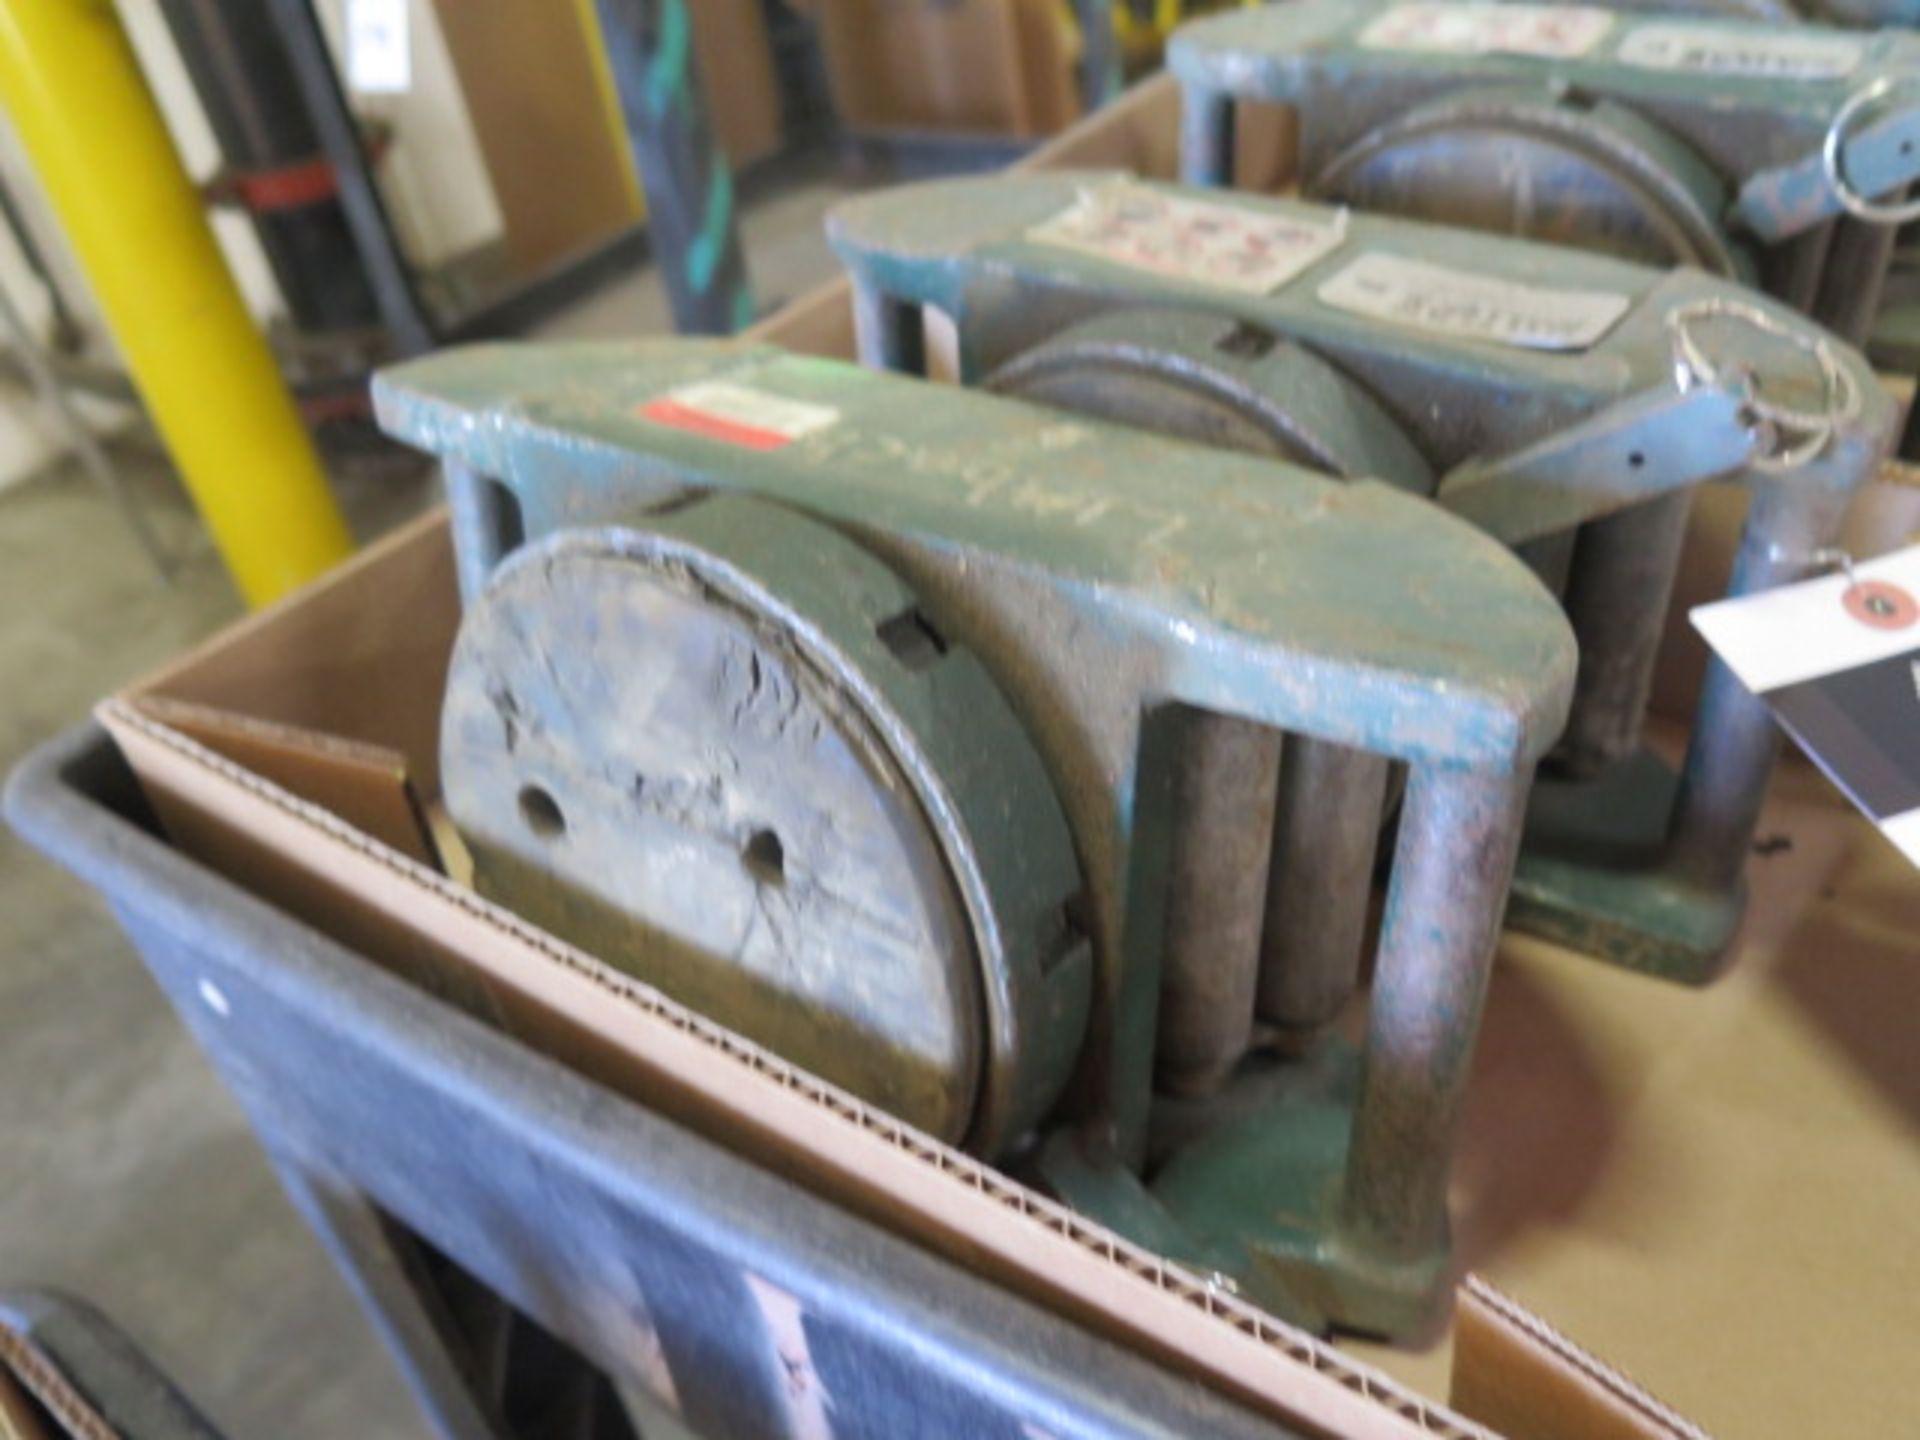 Hilman Machinery Dolleys (2) w/ Steering Bar (SOLD AS-IS - NO WARRANTY) - Image 4 of 5